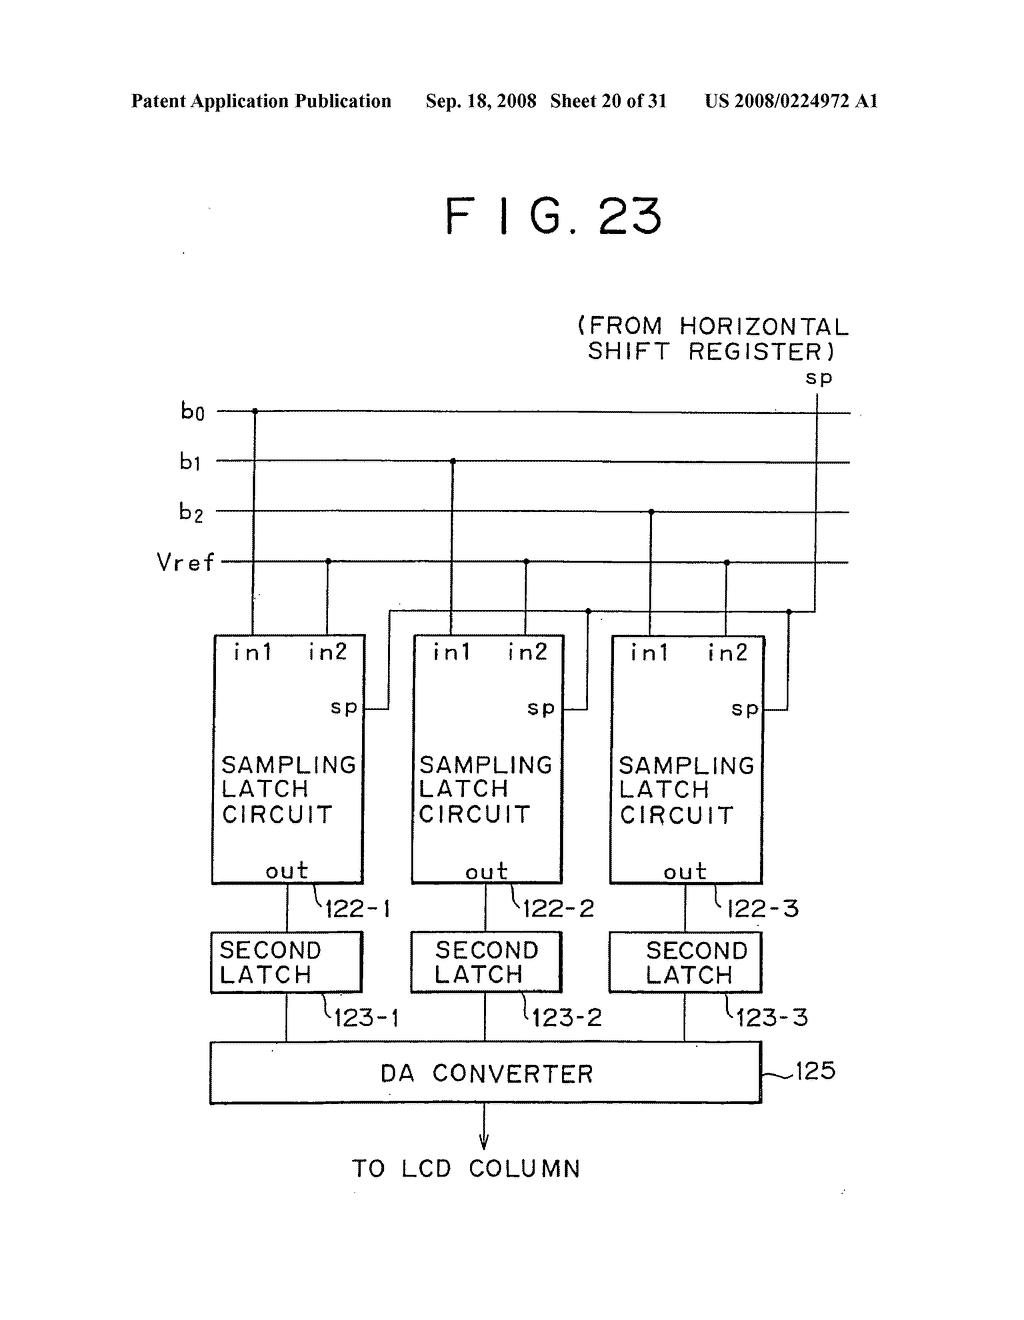 digital analog converter circuit level shift circuit shift rh patentsencyclopedia com Shift Register Diagram Block Shift Register Timing Diagram